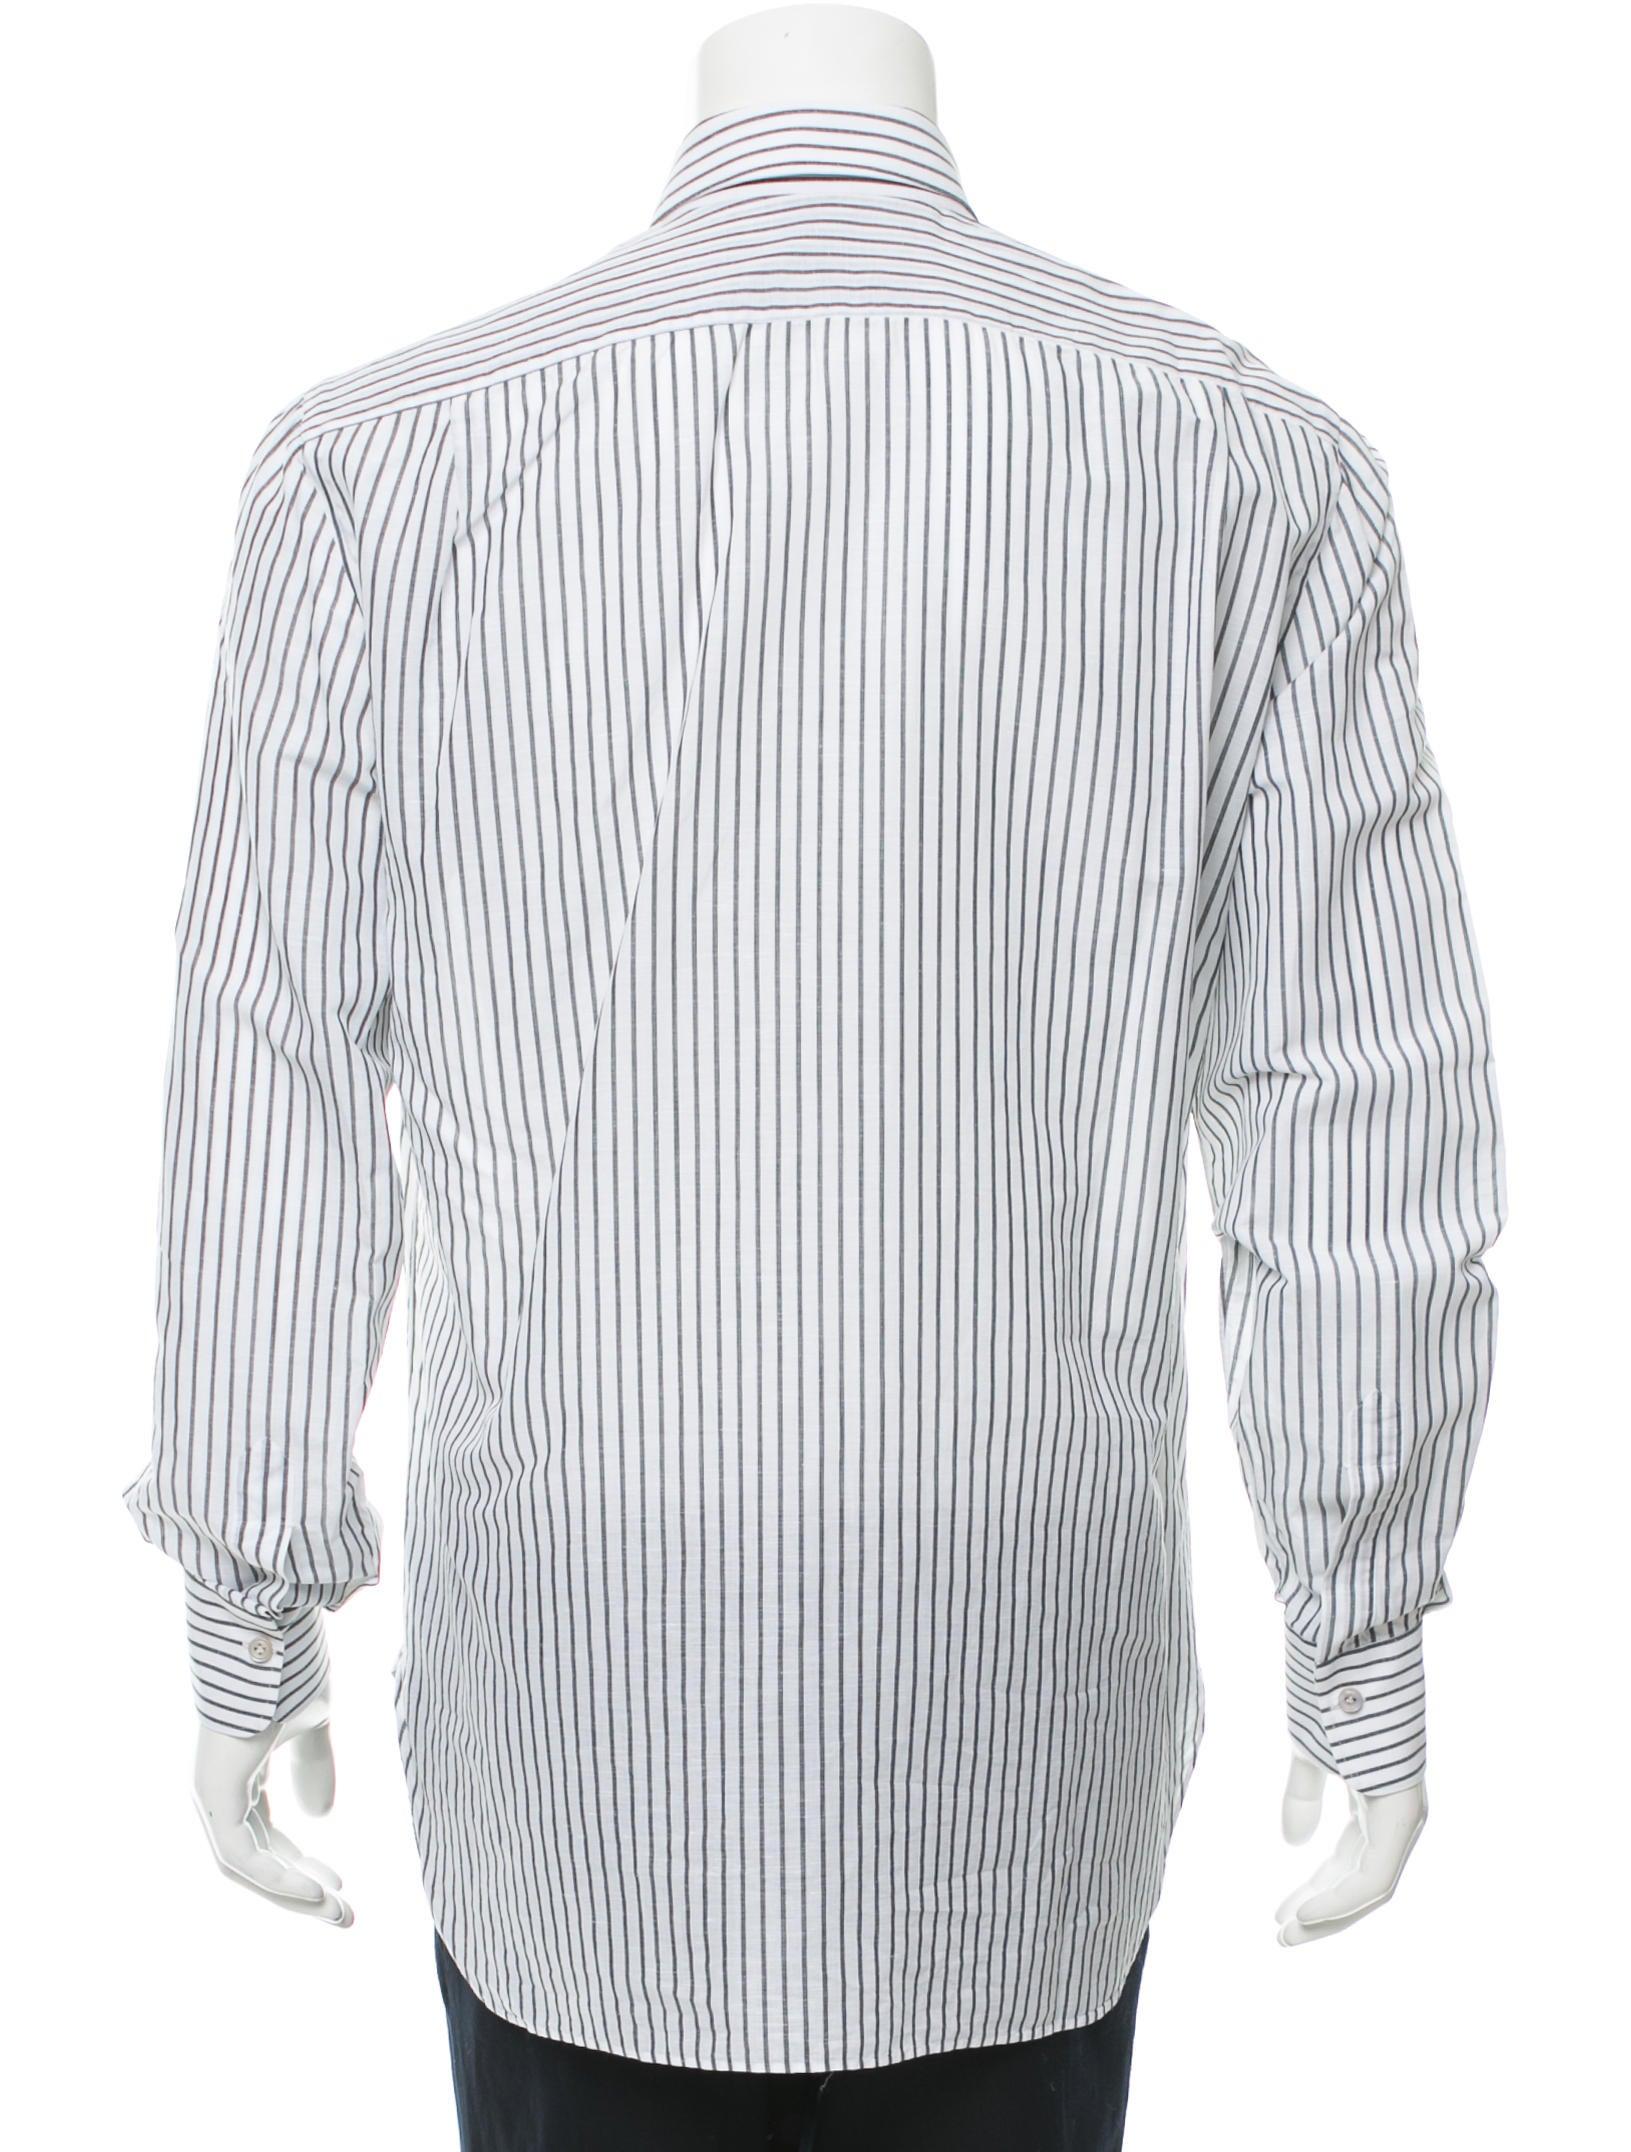 Kiton striped button up shirt clothing kit21464 the for Striped button up shirt mens